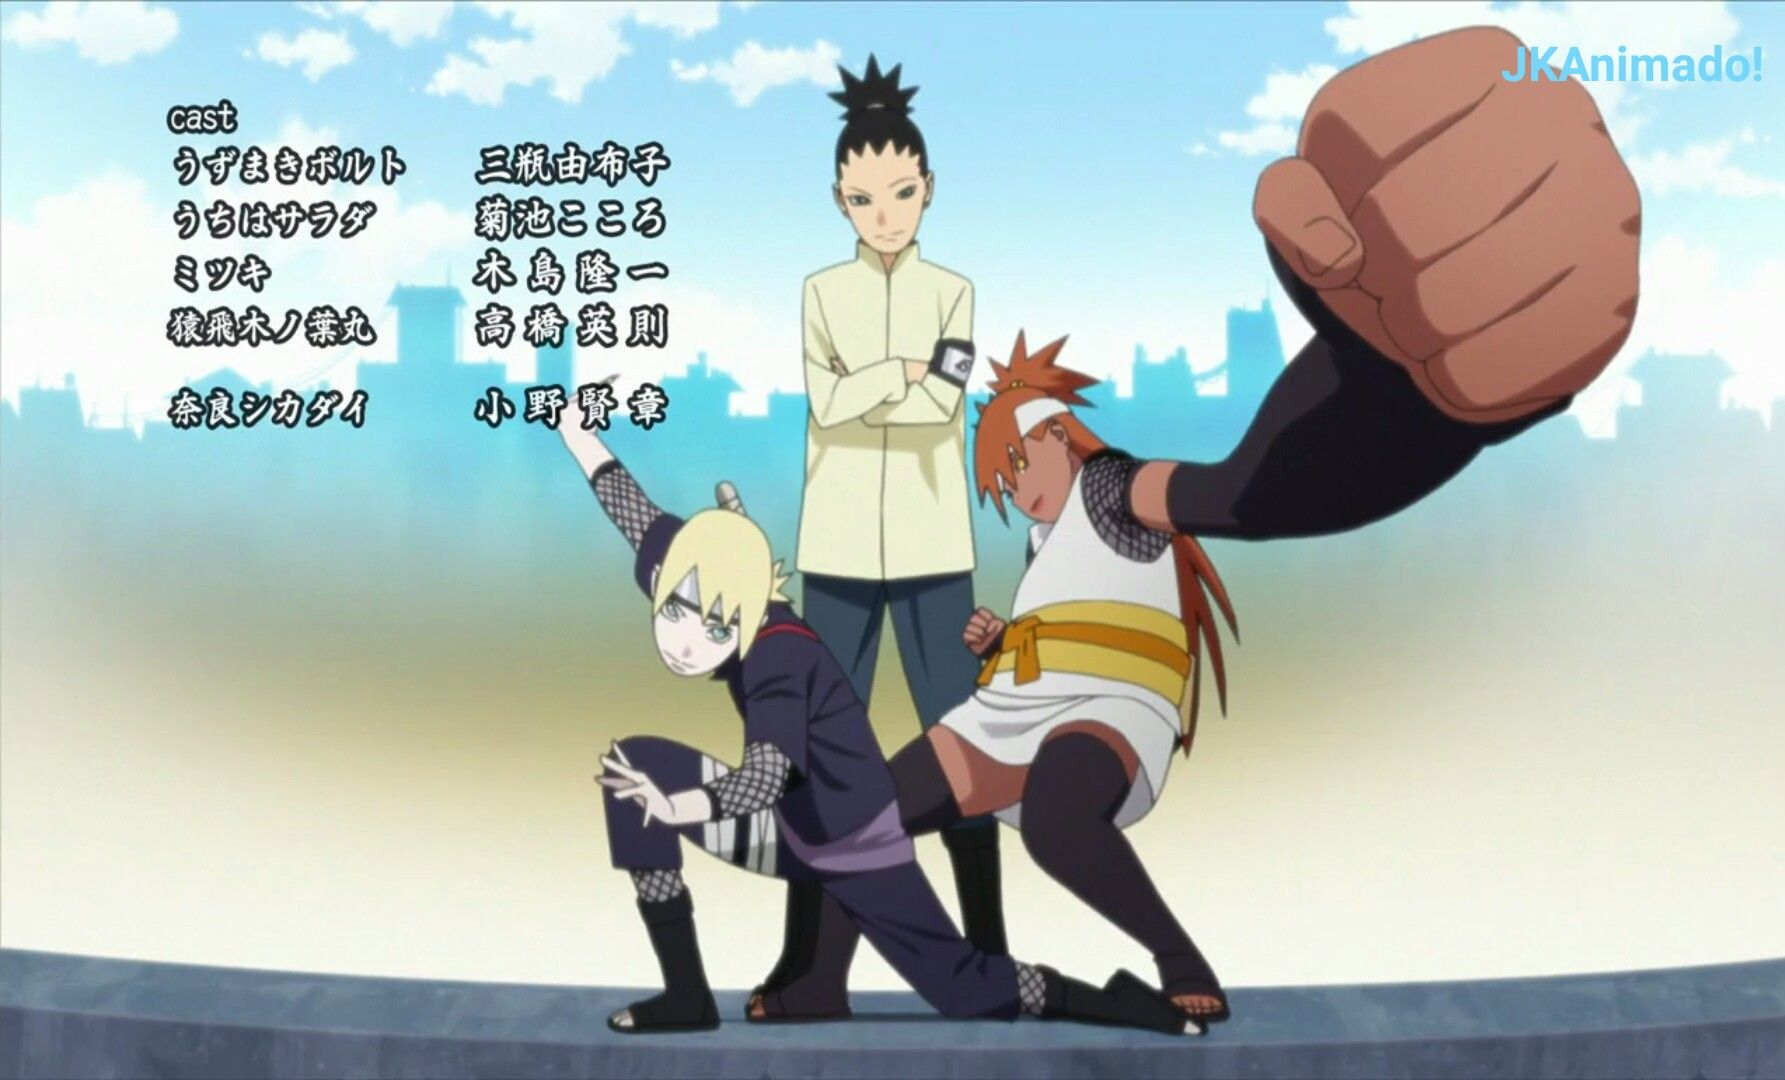 Pin oleh Andika Firmansyah di Naruto and boruto Olahraga